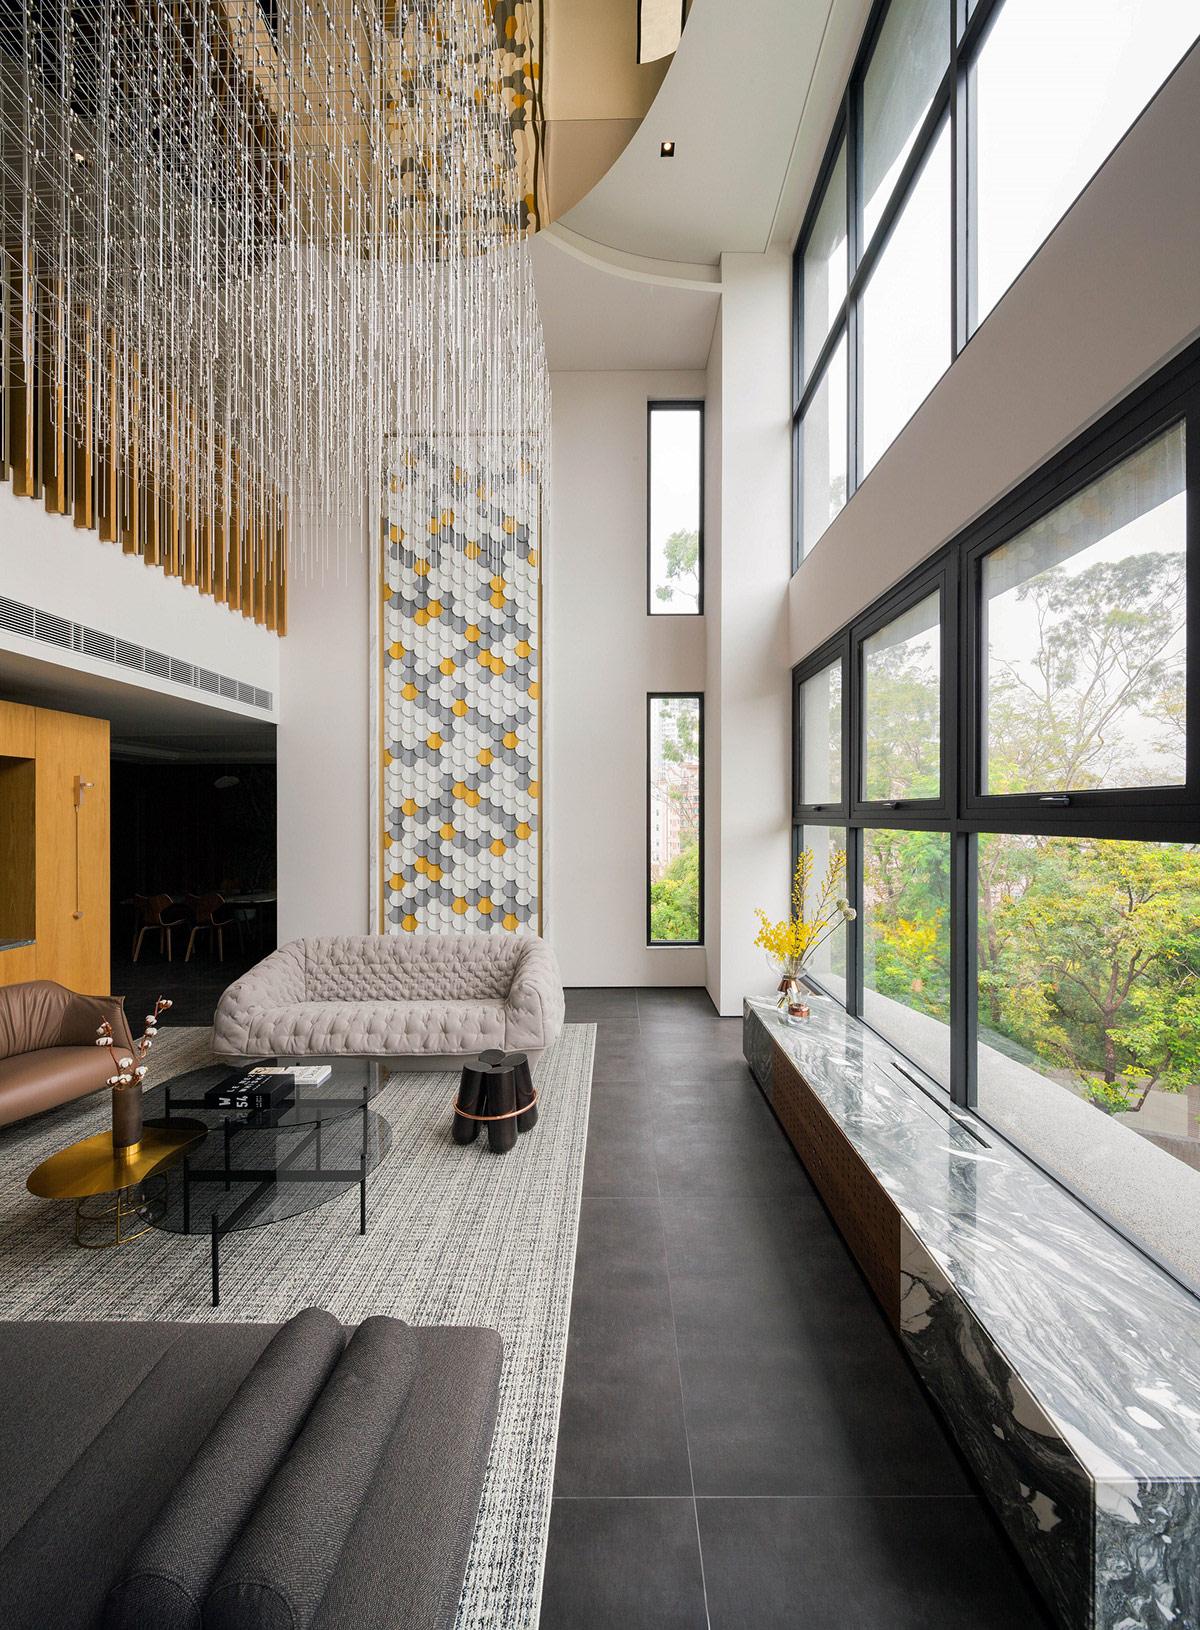 Luxury Living Room Room Design: Simple Luxury Interior With Modern Oriental Elegance